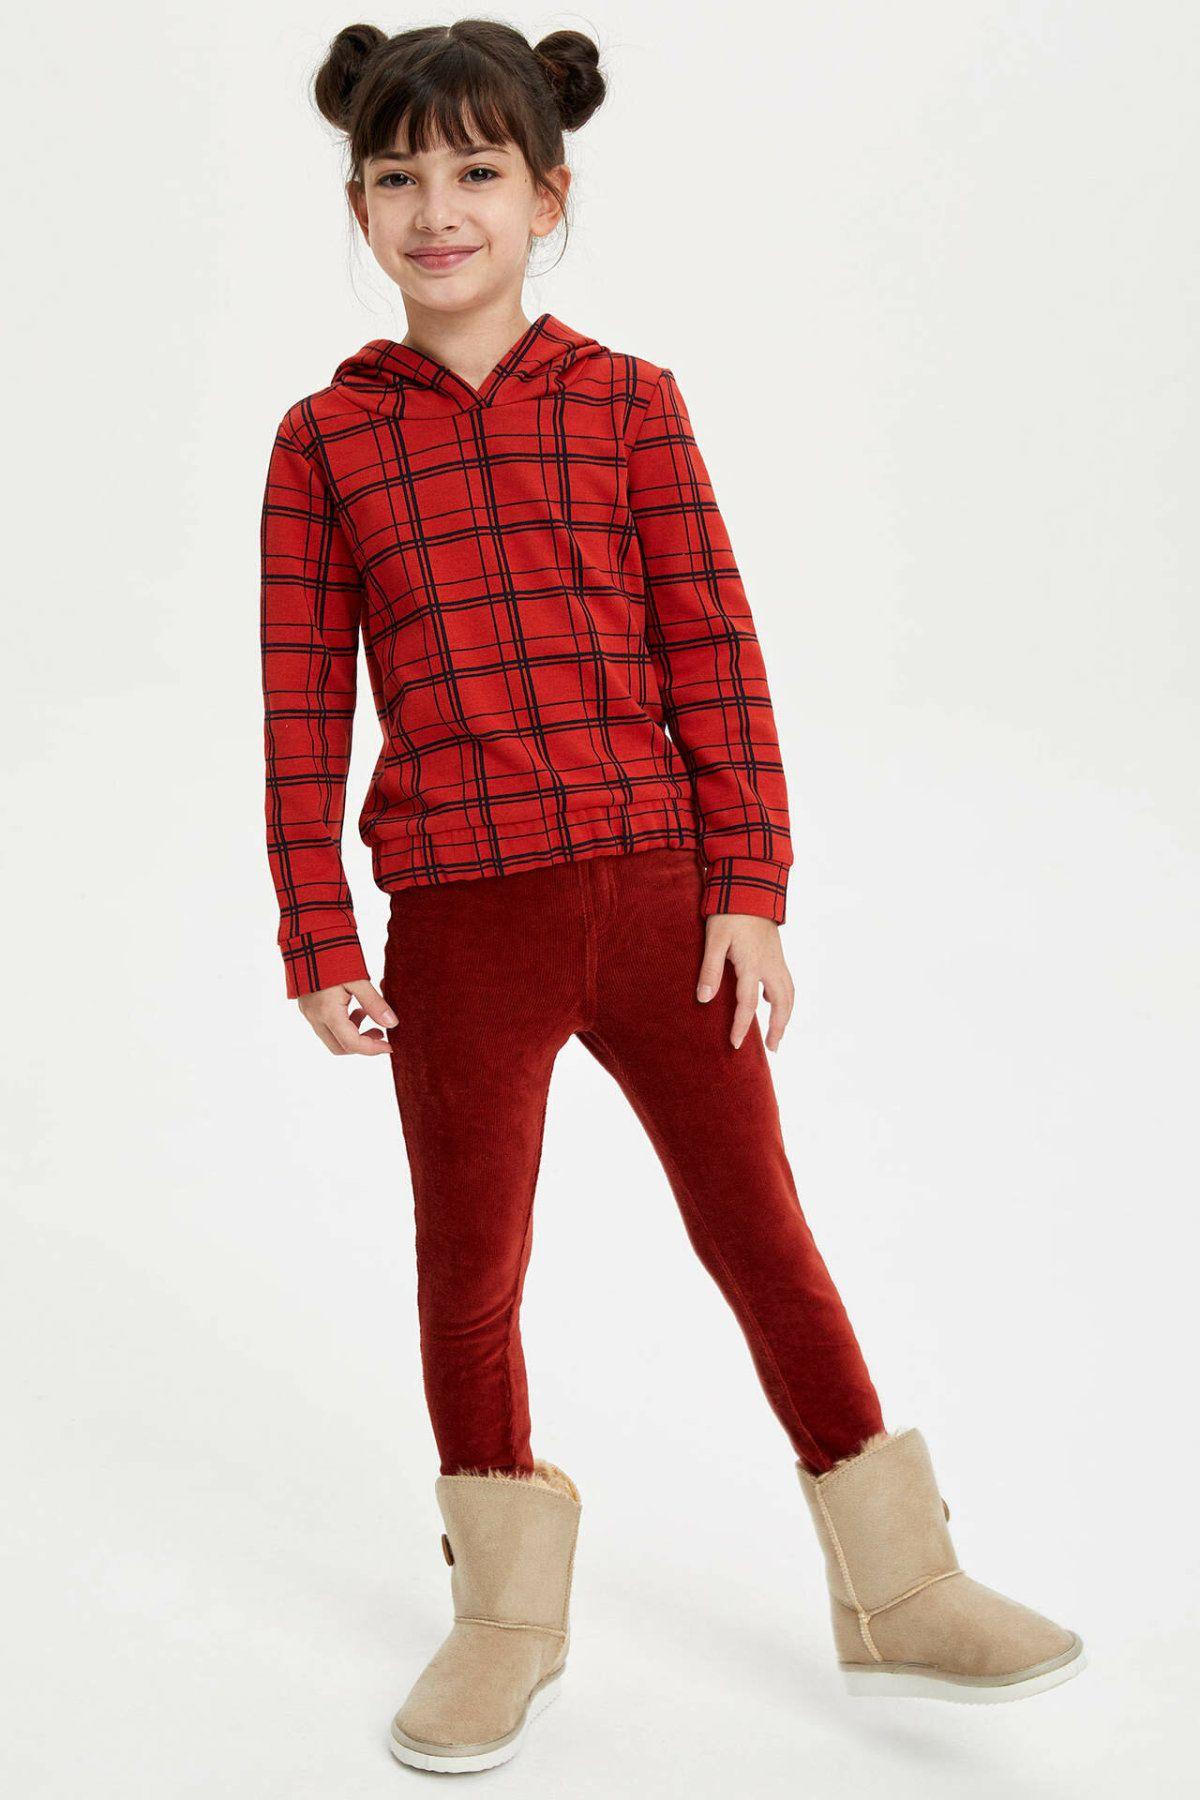 DeFacto Casual Girl Leggings Kids Fashion Elastic Waist Long Pants High Quality Skinny Pure Color Pants New -H6991A619AU